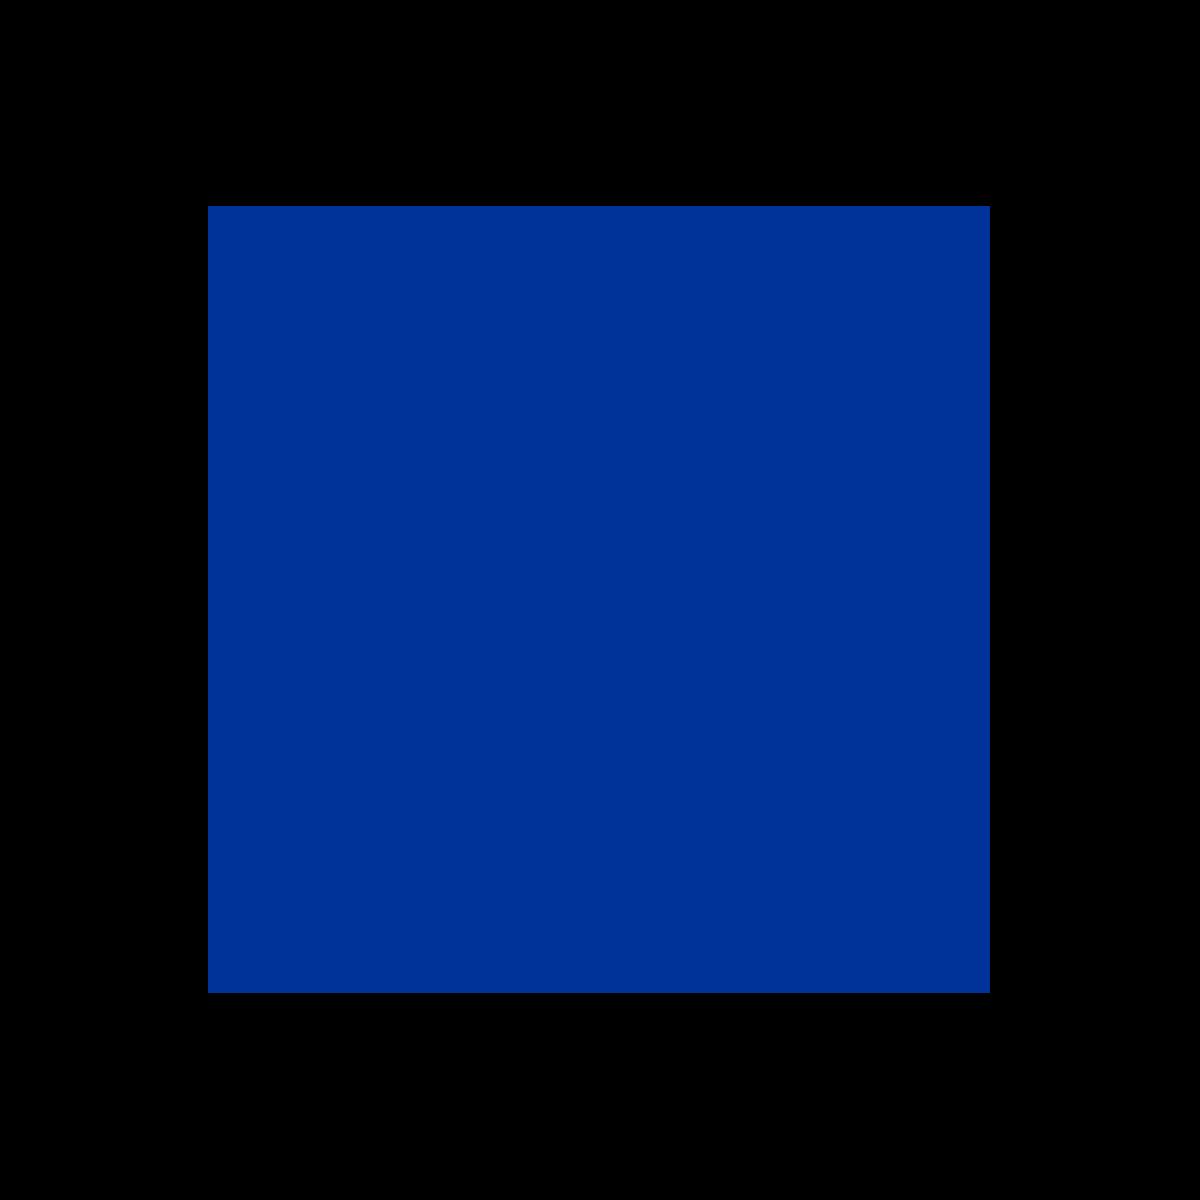 noun_analysis_2063718